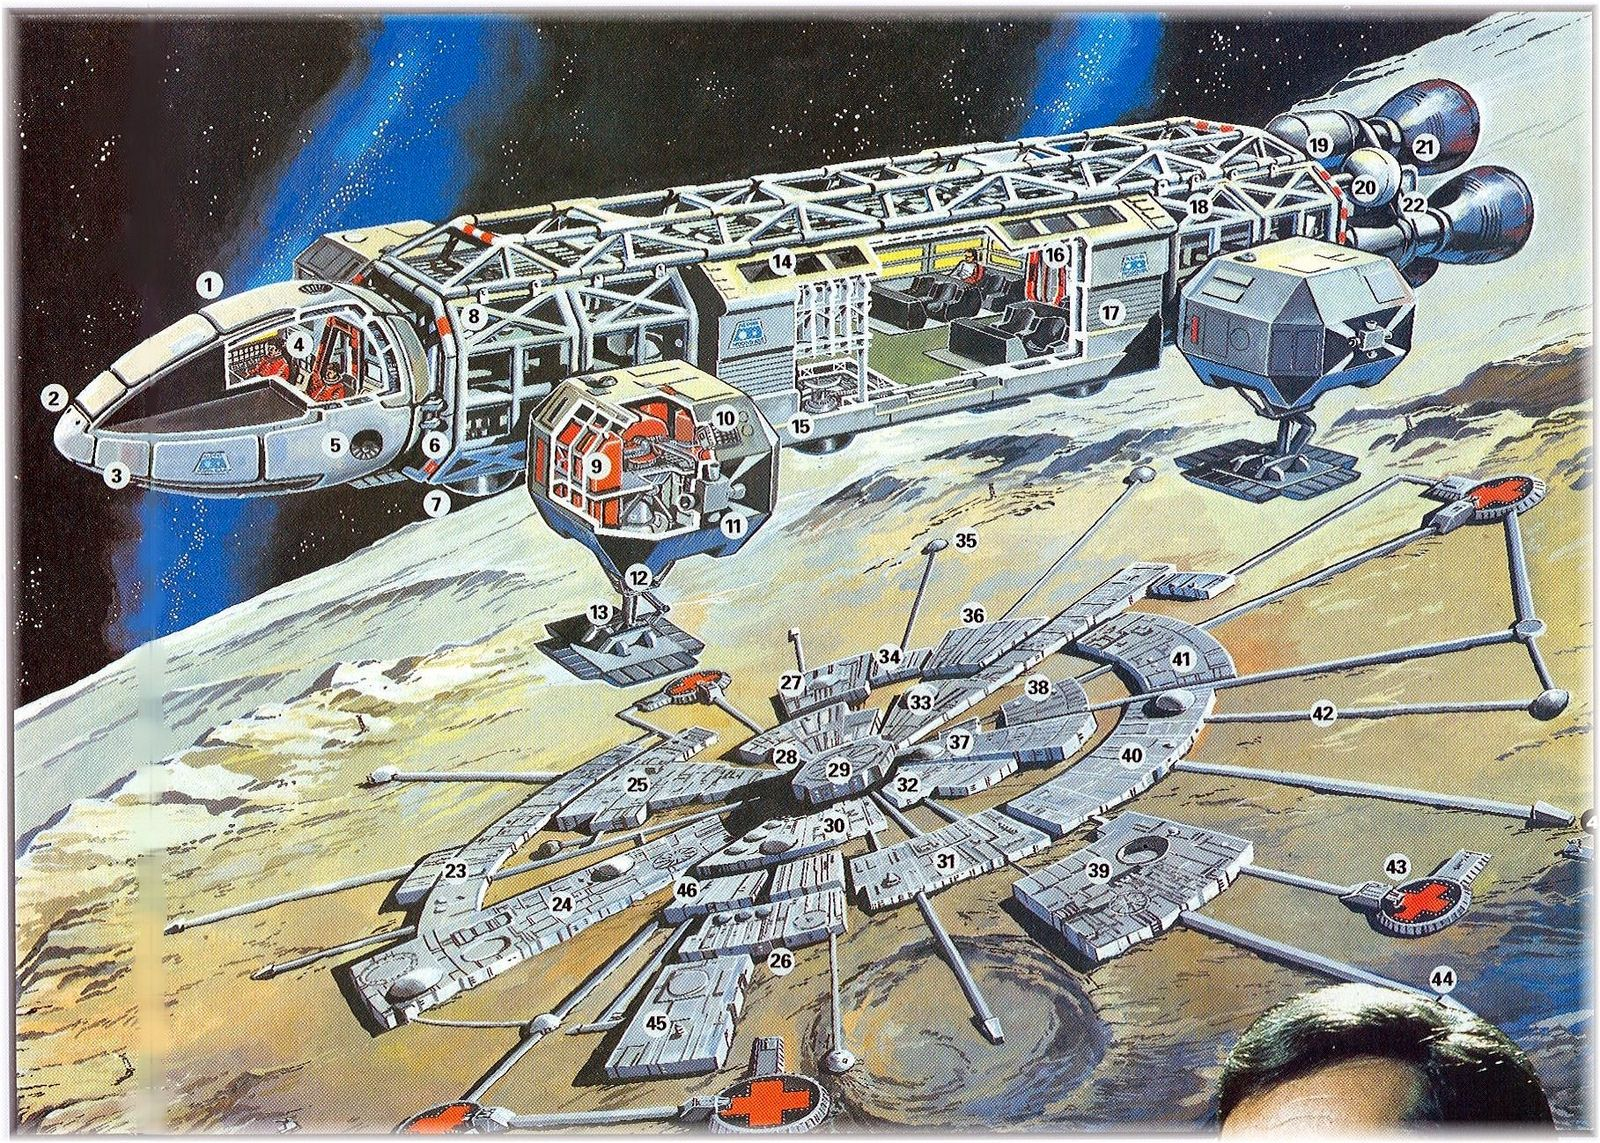 spaceship cutaway diagram kenwood ddx419 wiring space 1999 moonbase alpha map and eagle